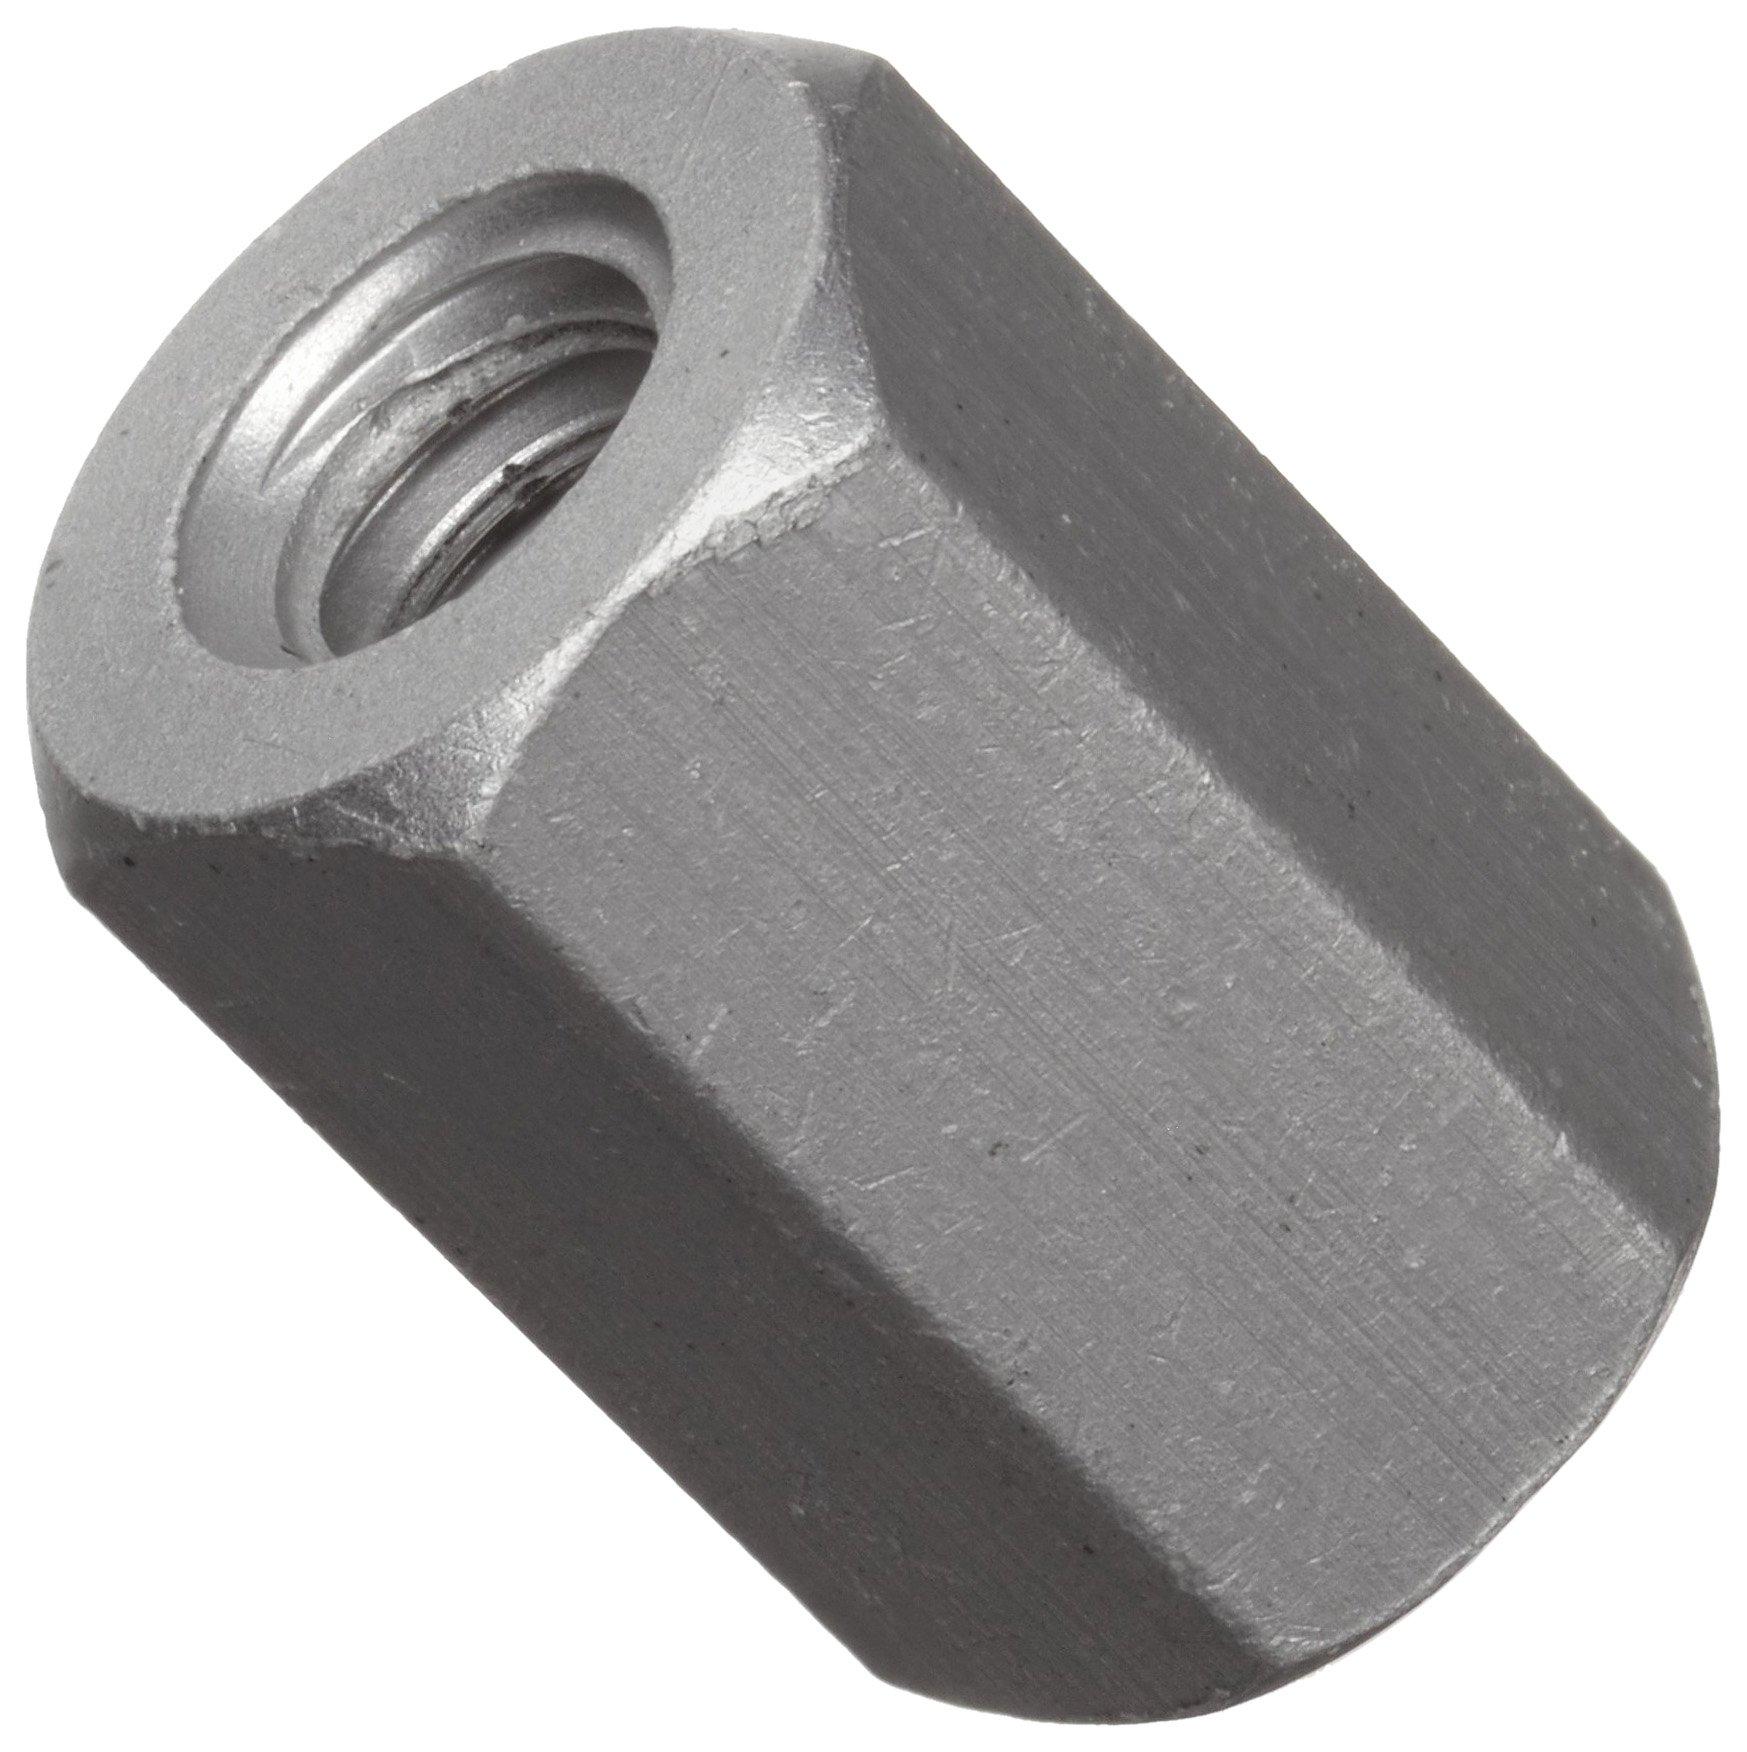 Hex Standoff, Aluminum, Plain Finish, Female, Right Hand, #6-32 Screw Size, 3/8'' Length (Pack of 25)